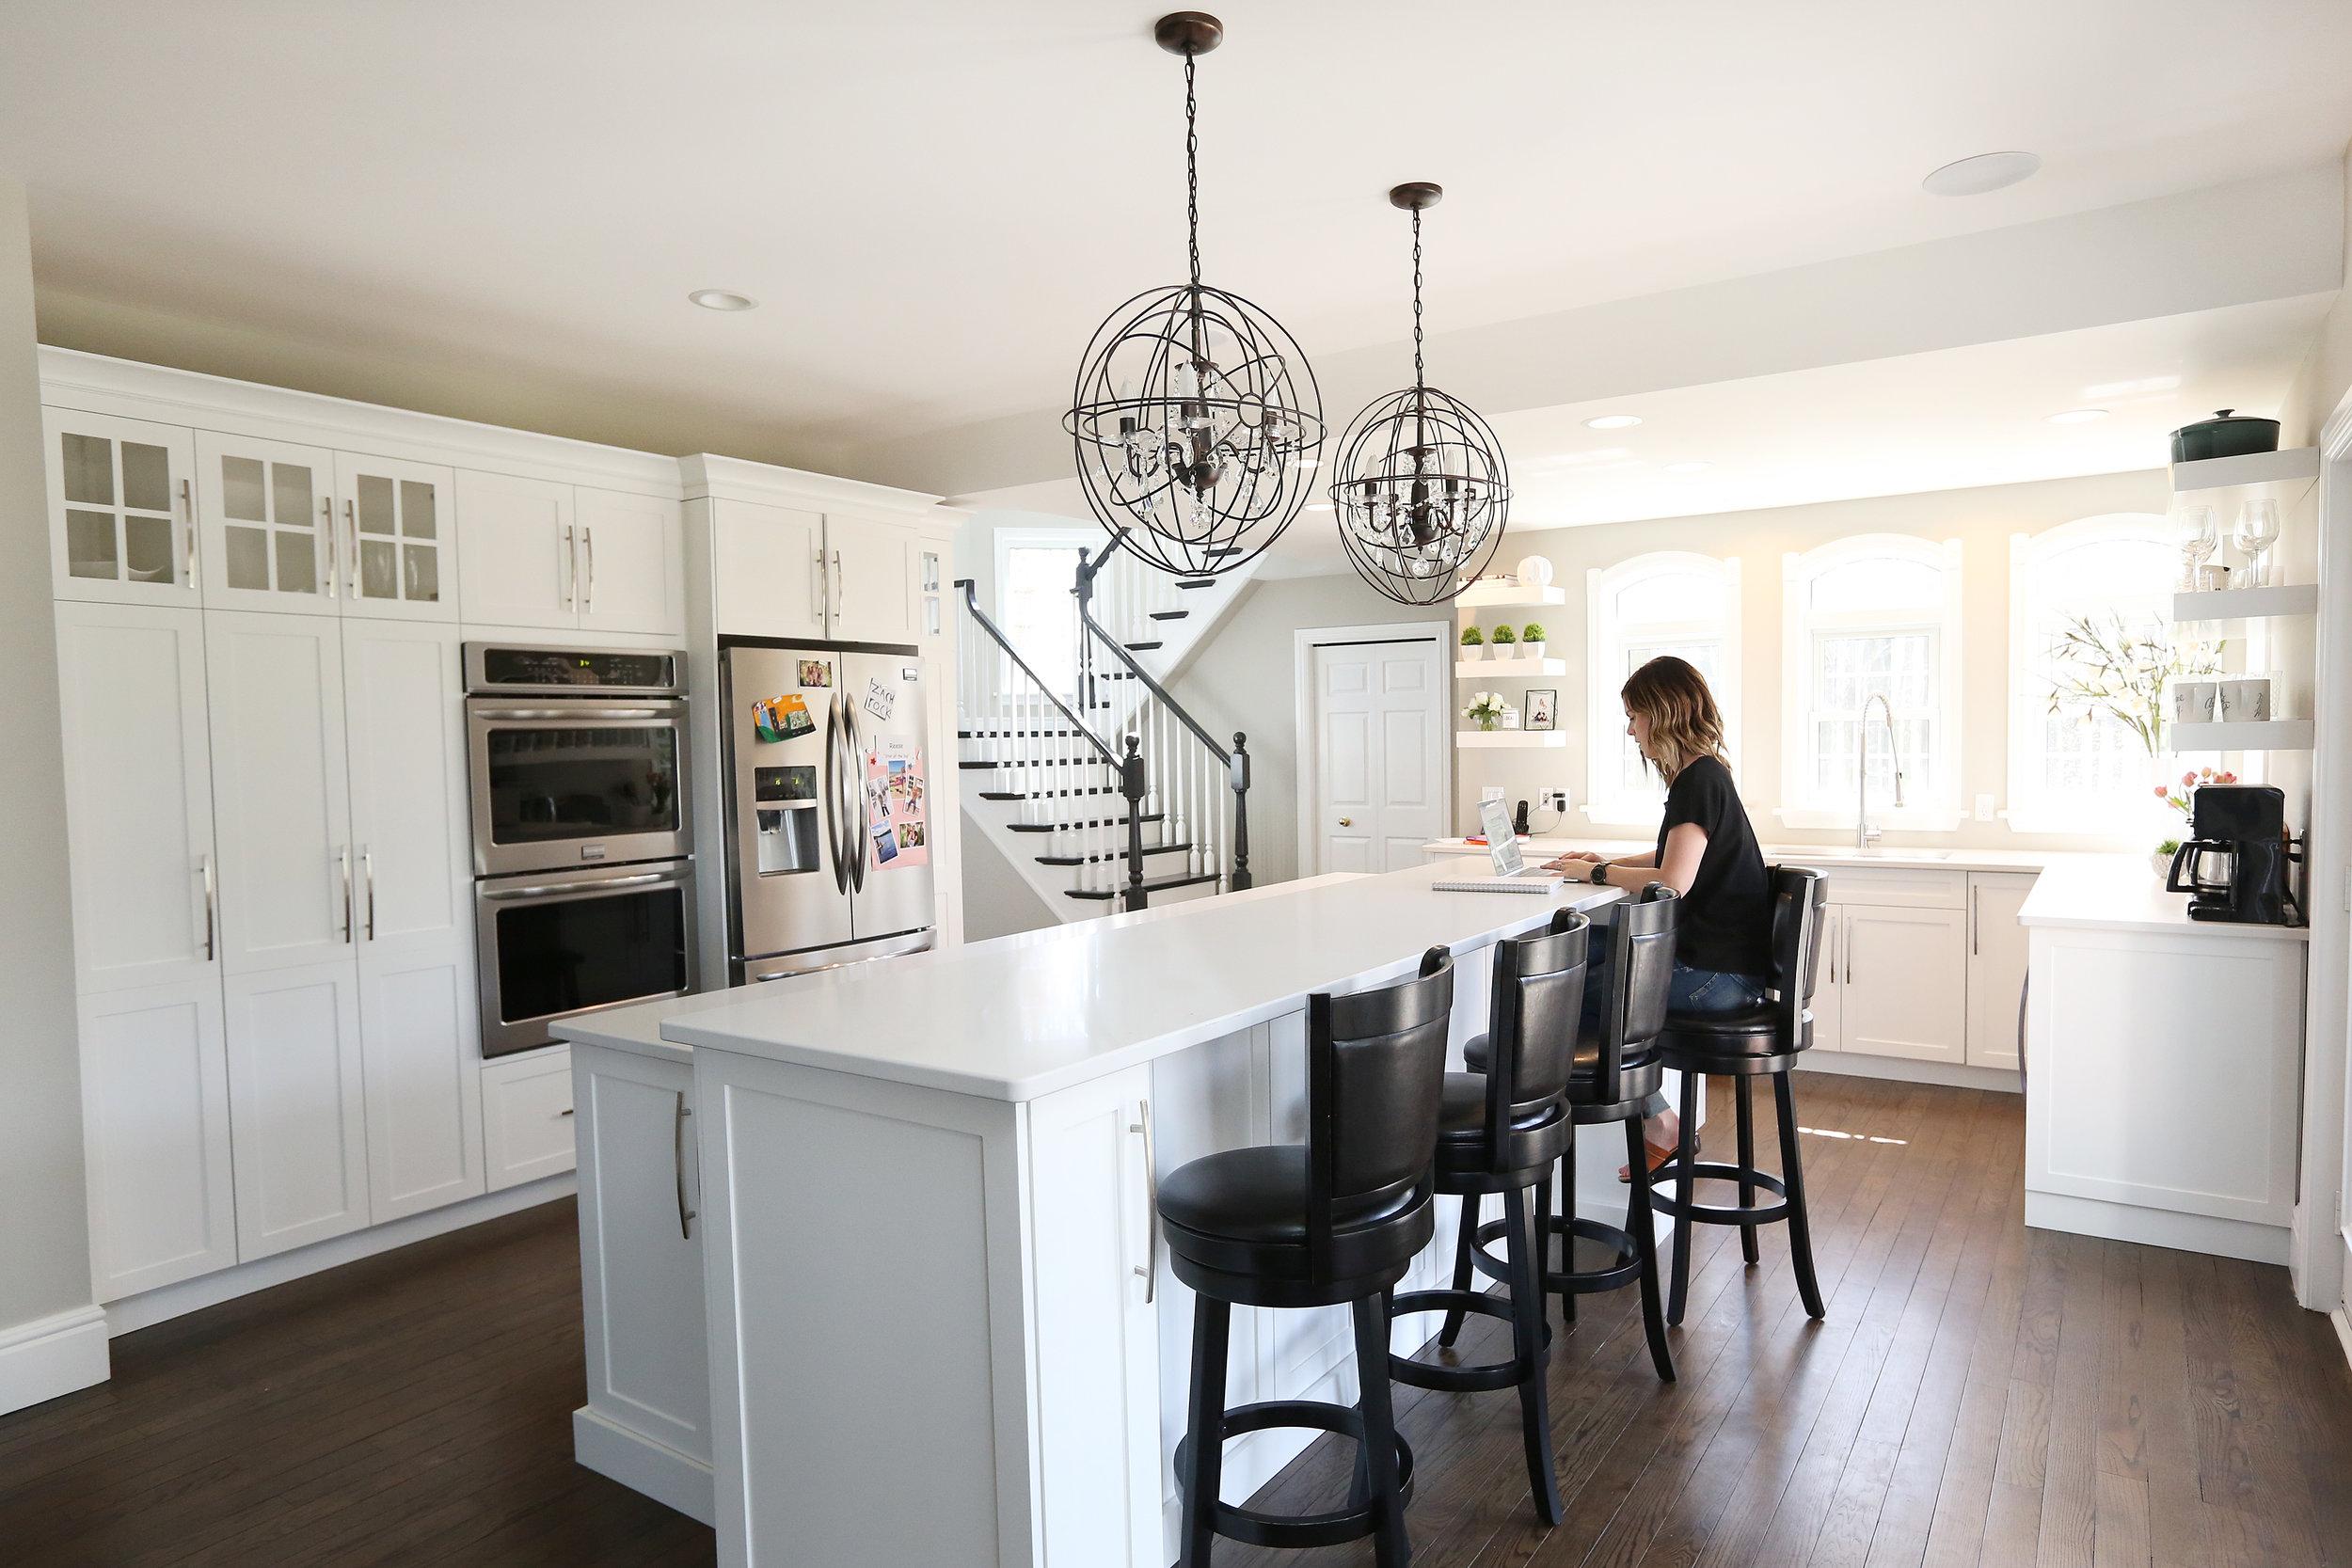 Kitchen Reno - Moving into the Ex-Wife's House - Kitchen Reno - Jamie Scrimgeour